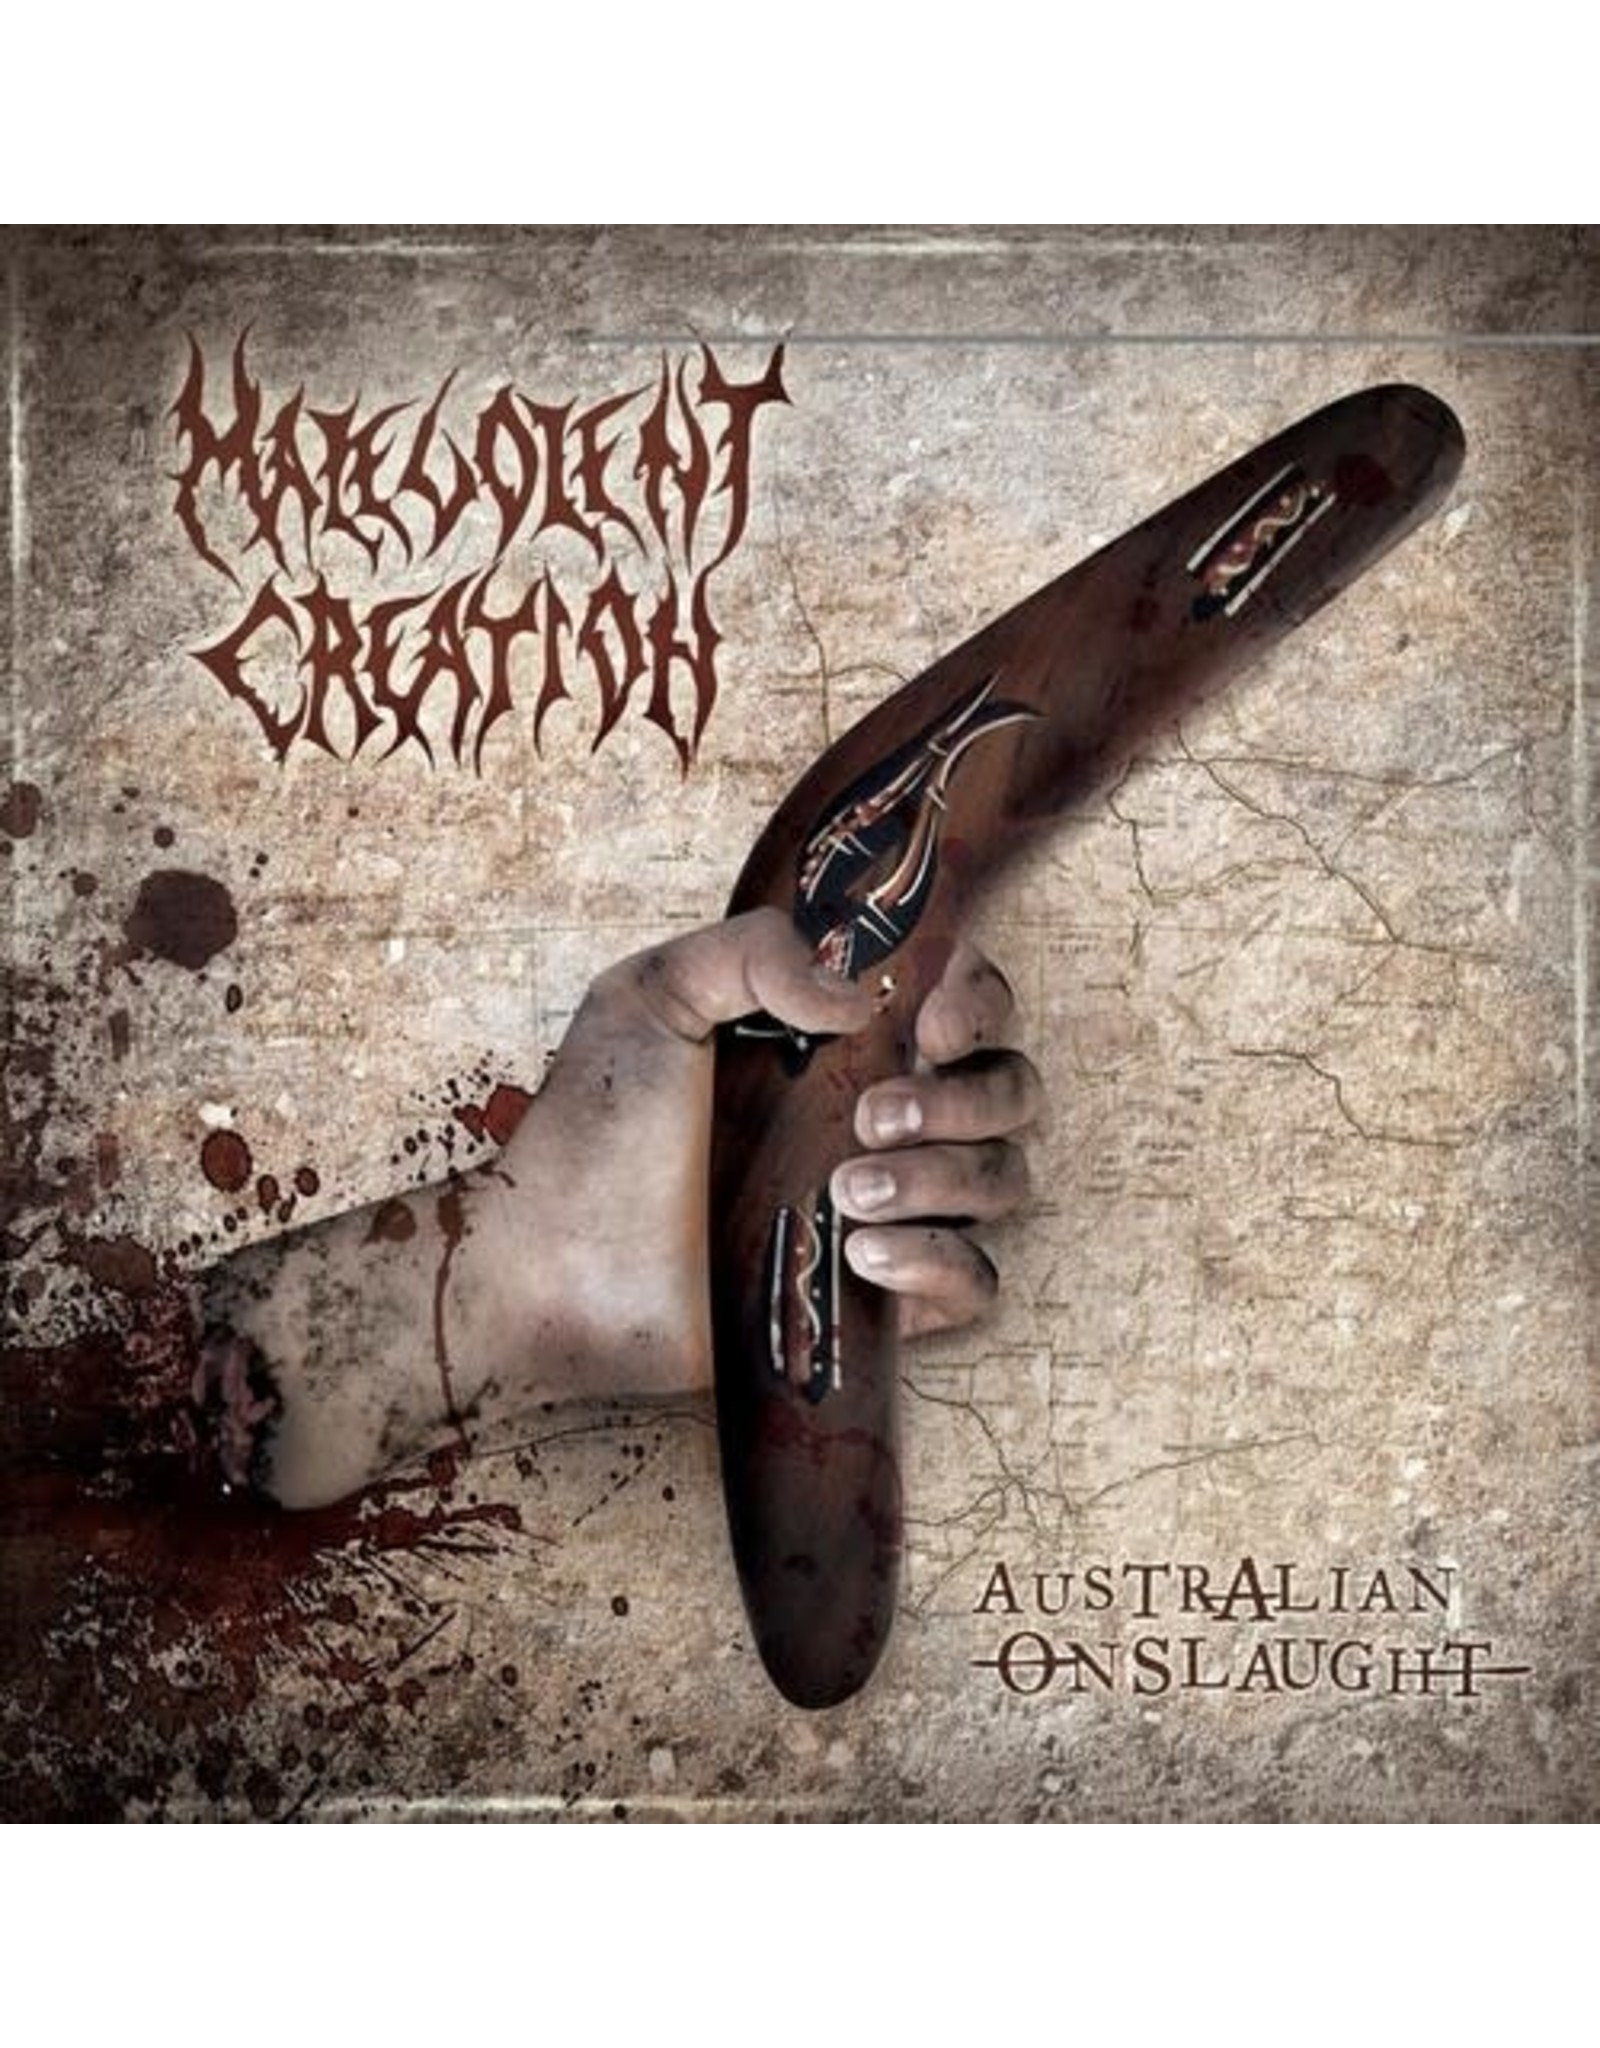 New Vinyl Malevolent Creation - Australian Onslaught LP